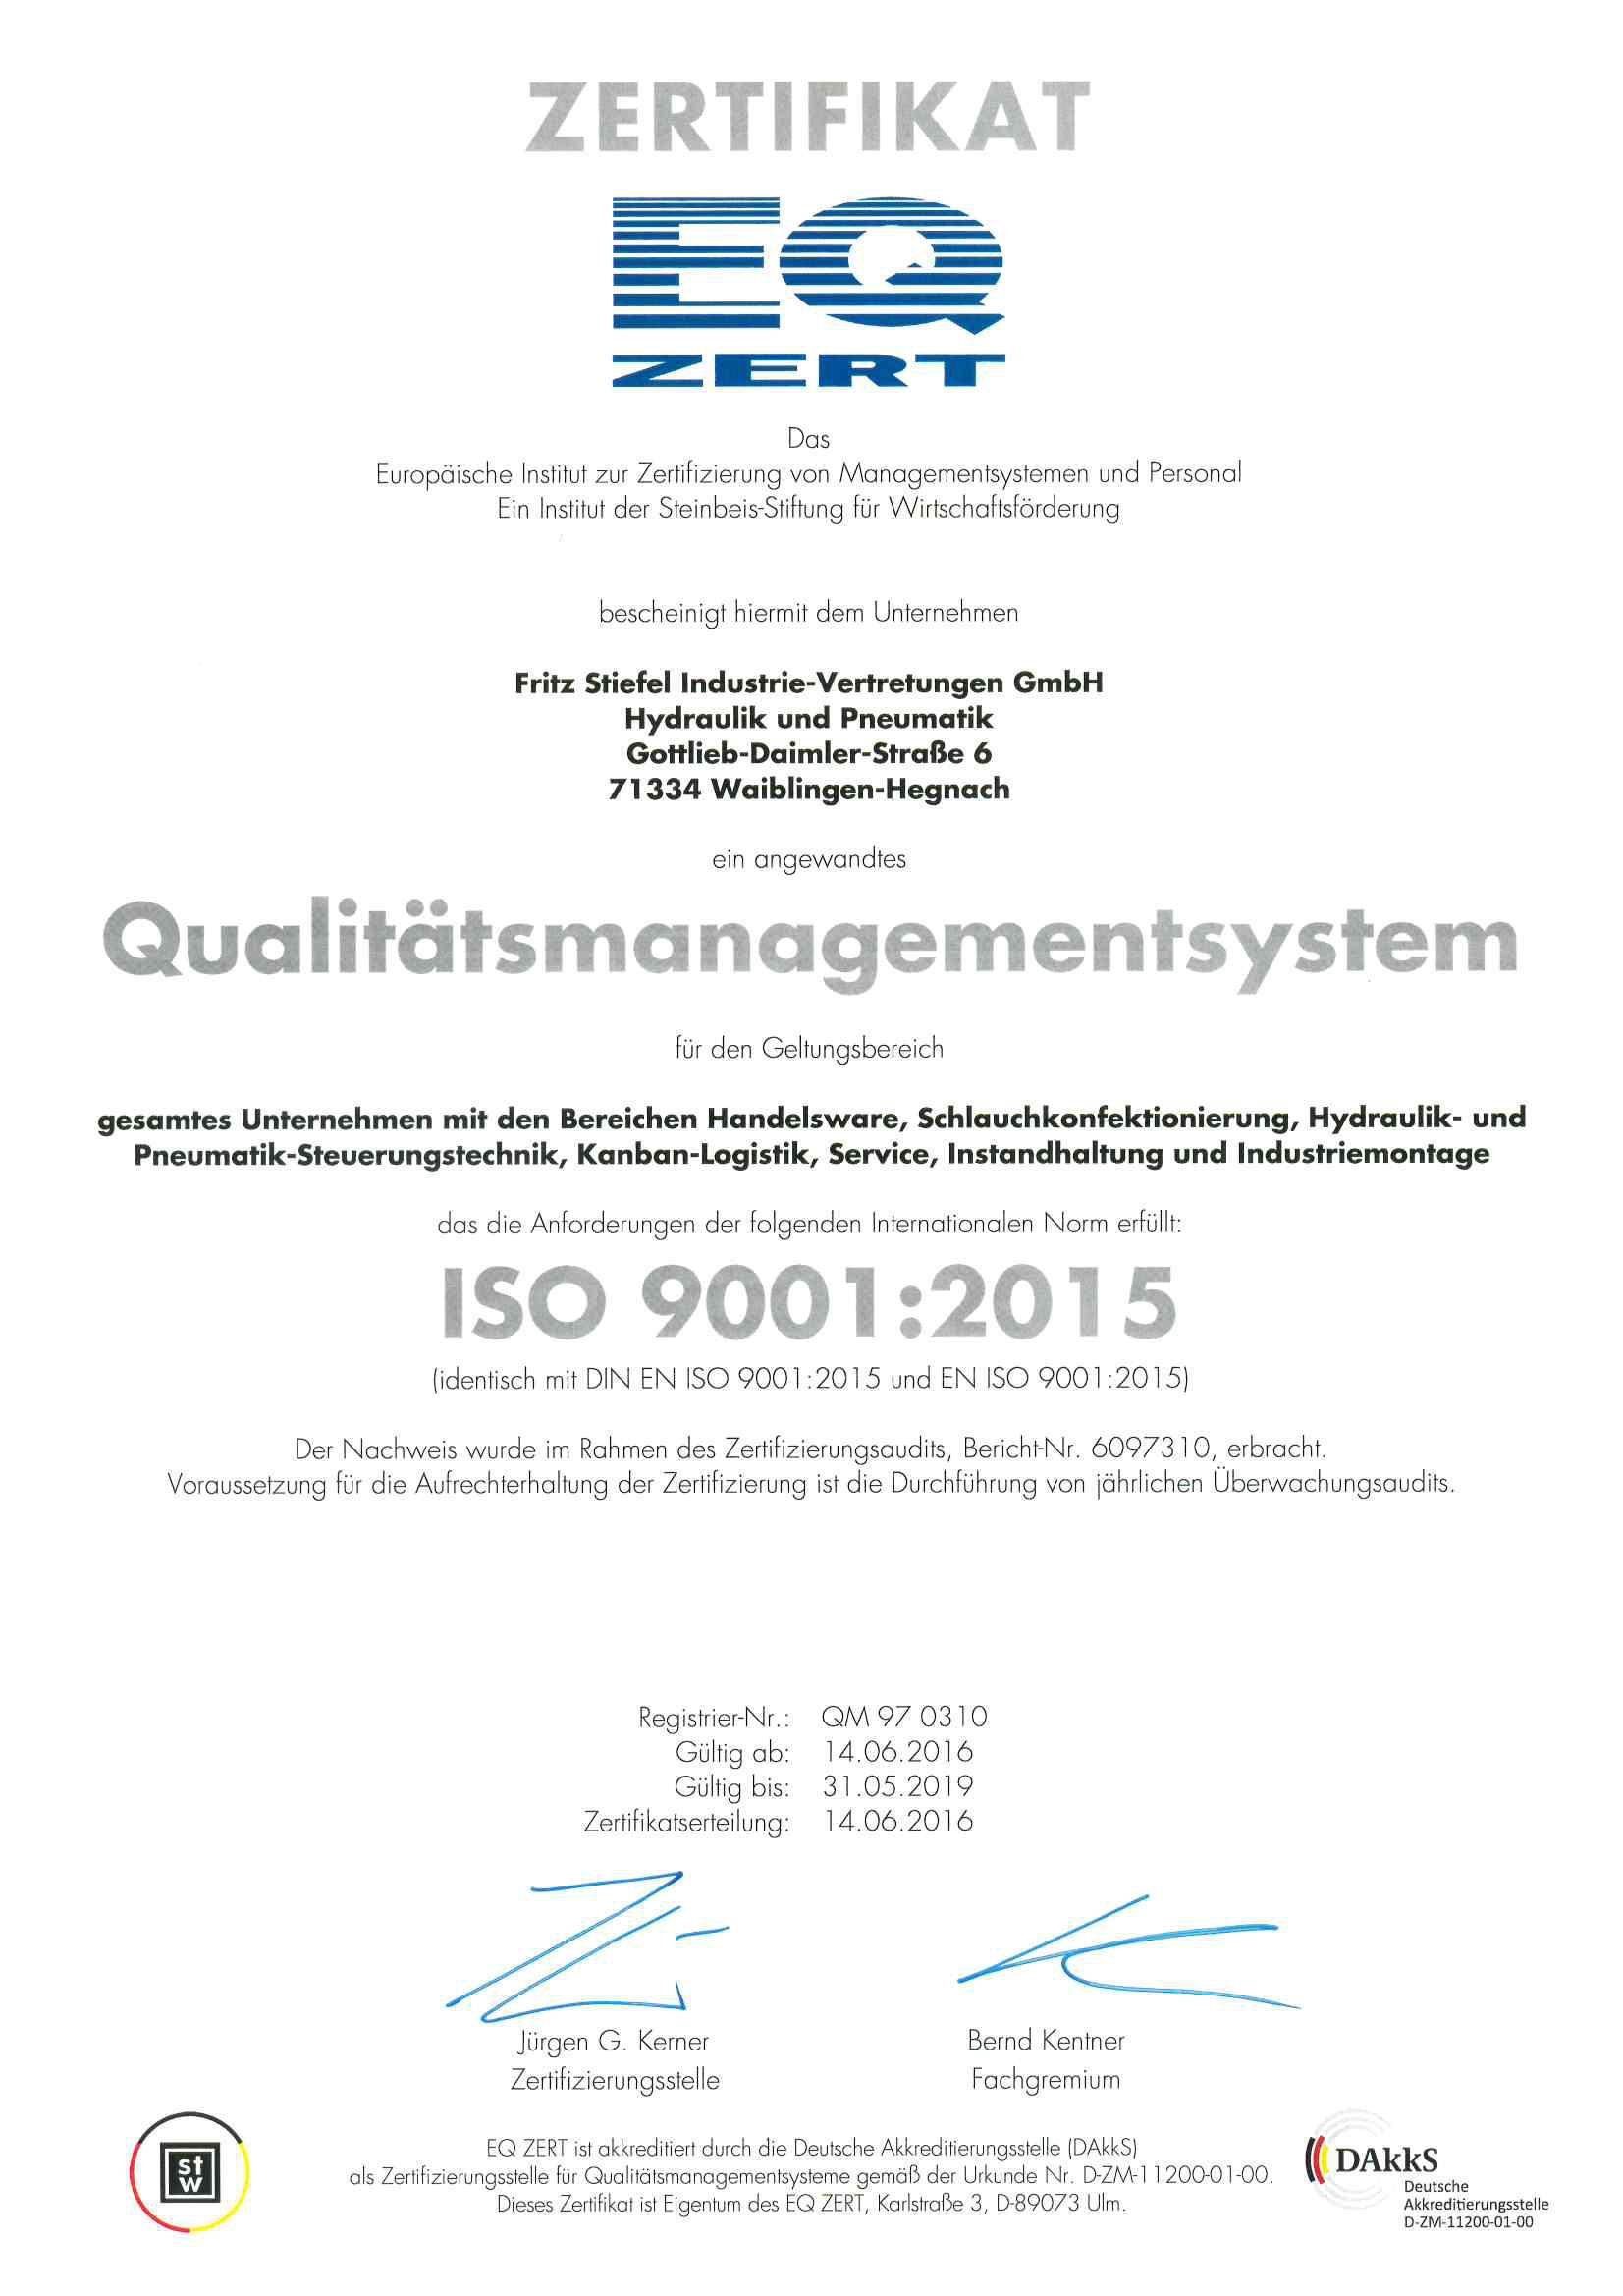 Certification Stiefel Waiblingen